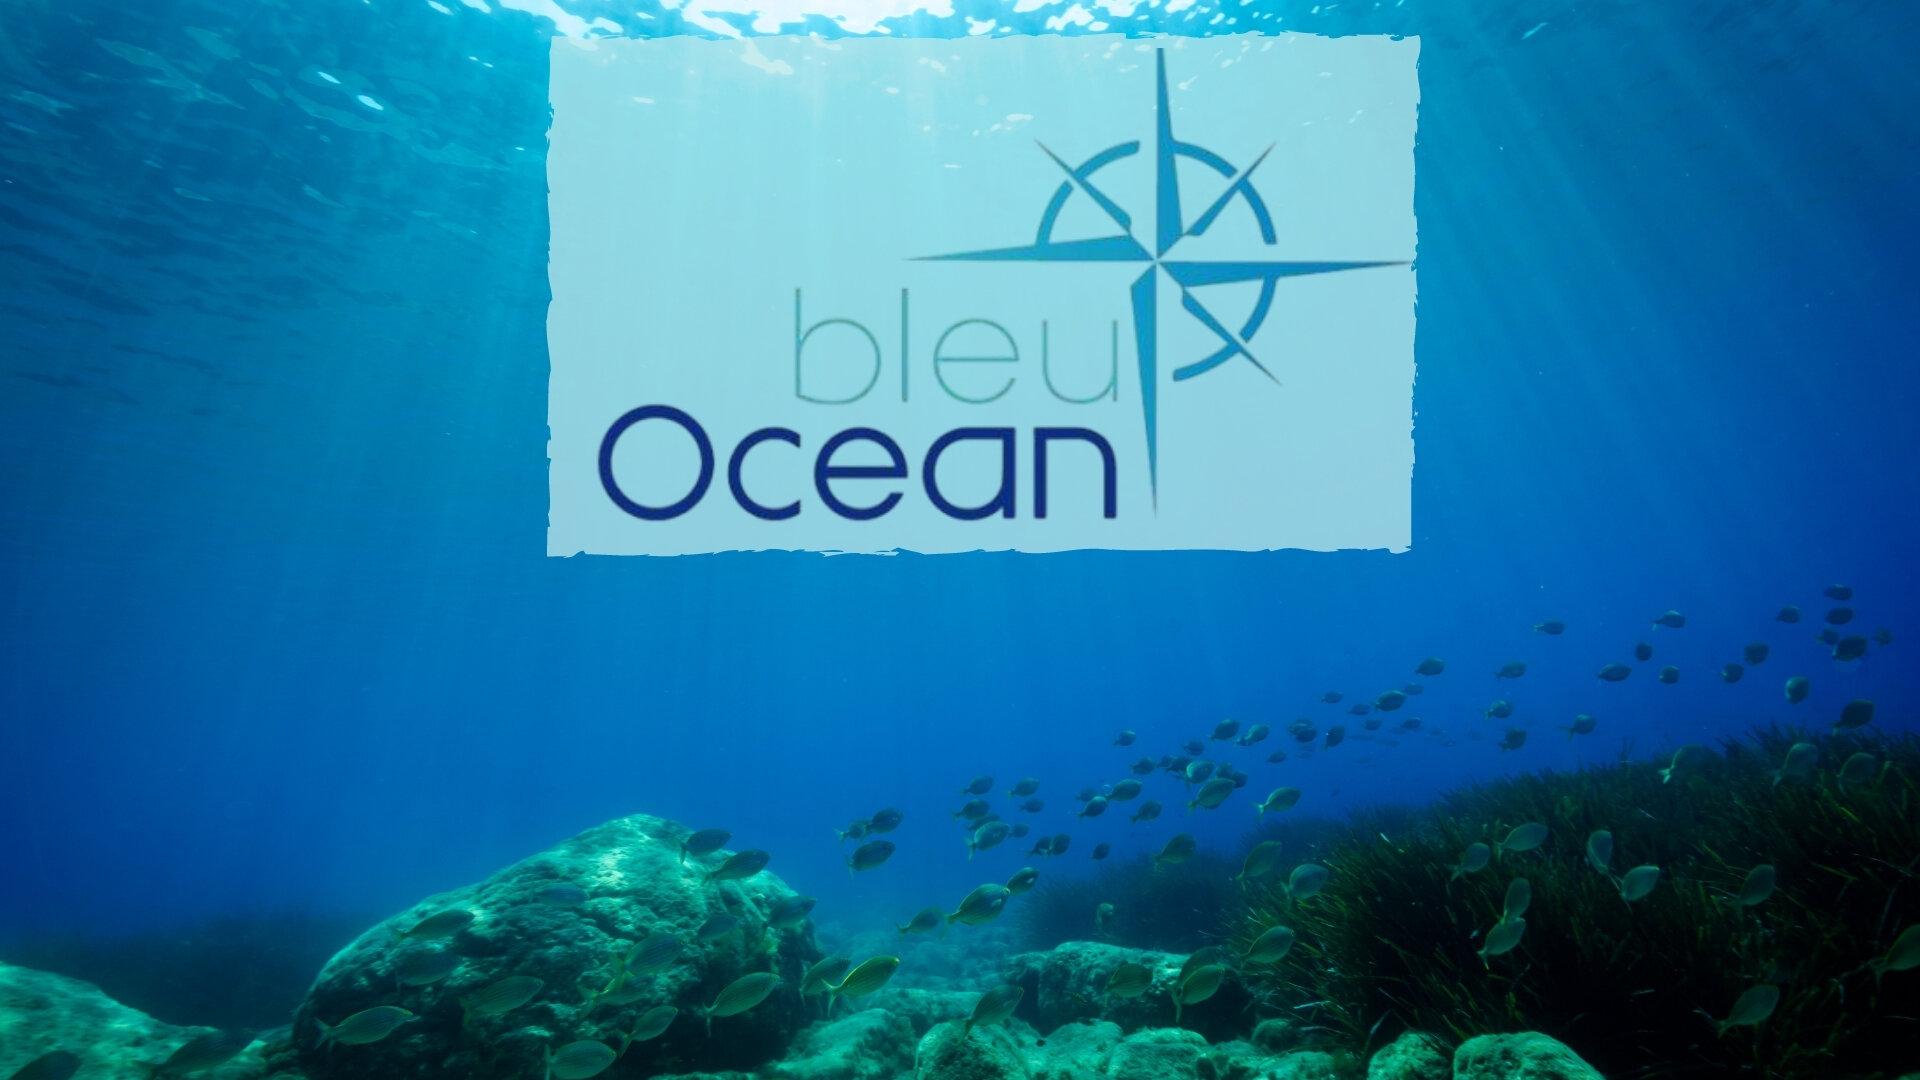 Bleu océan : pêche(s) à Nuku Hiva